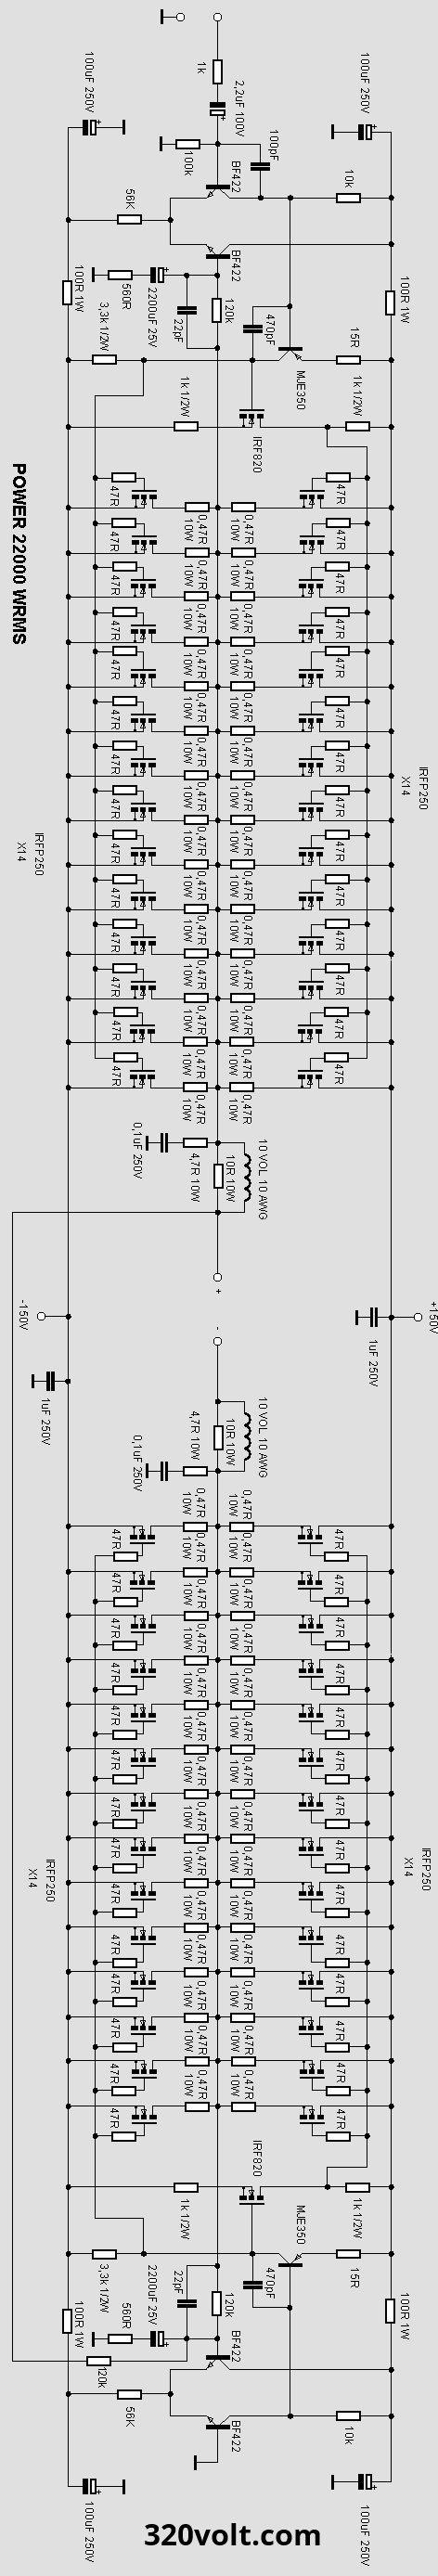 Tda2005 Power Amplifier Circuit Electronic Kit T Circuits Amplifiercircuitsaudio Completeinductioncookercircuit